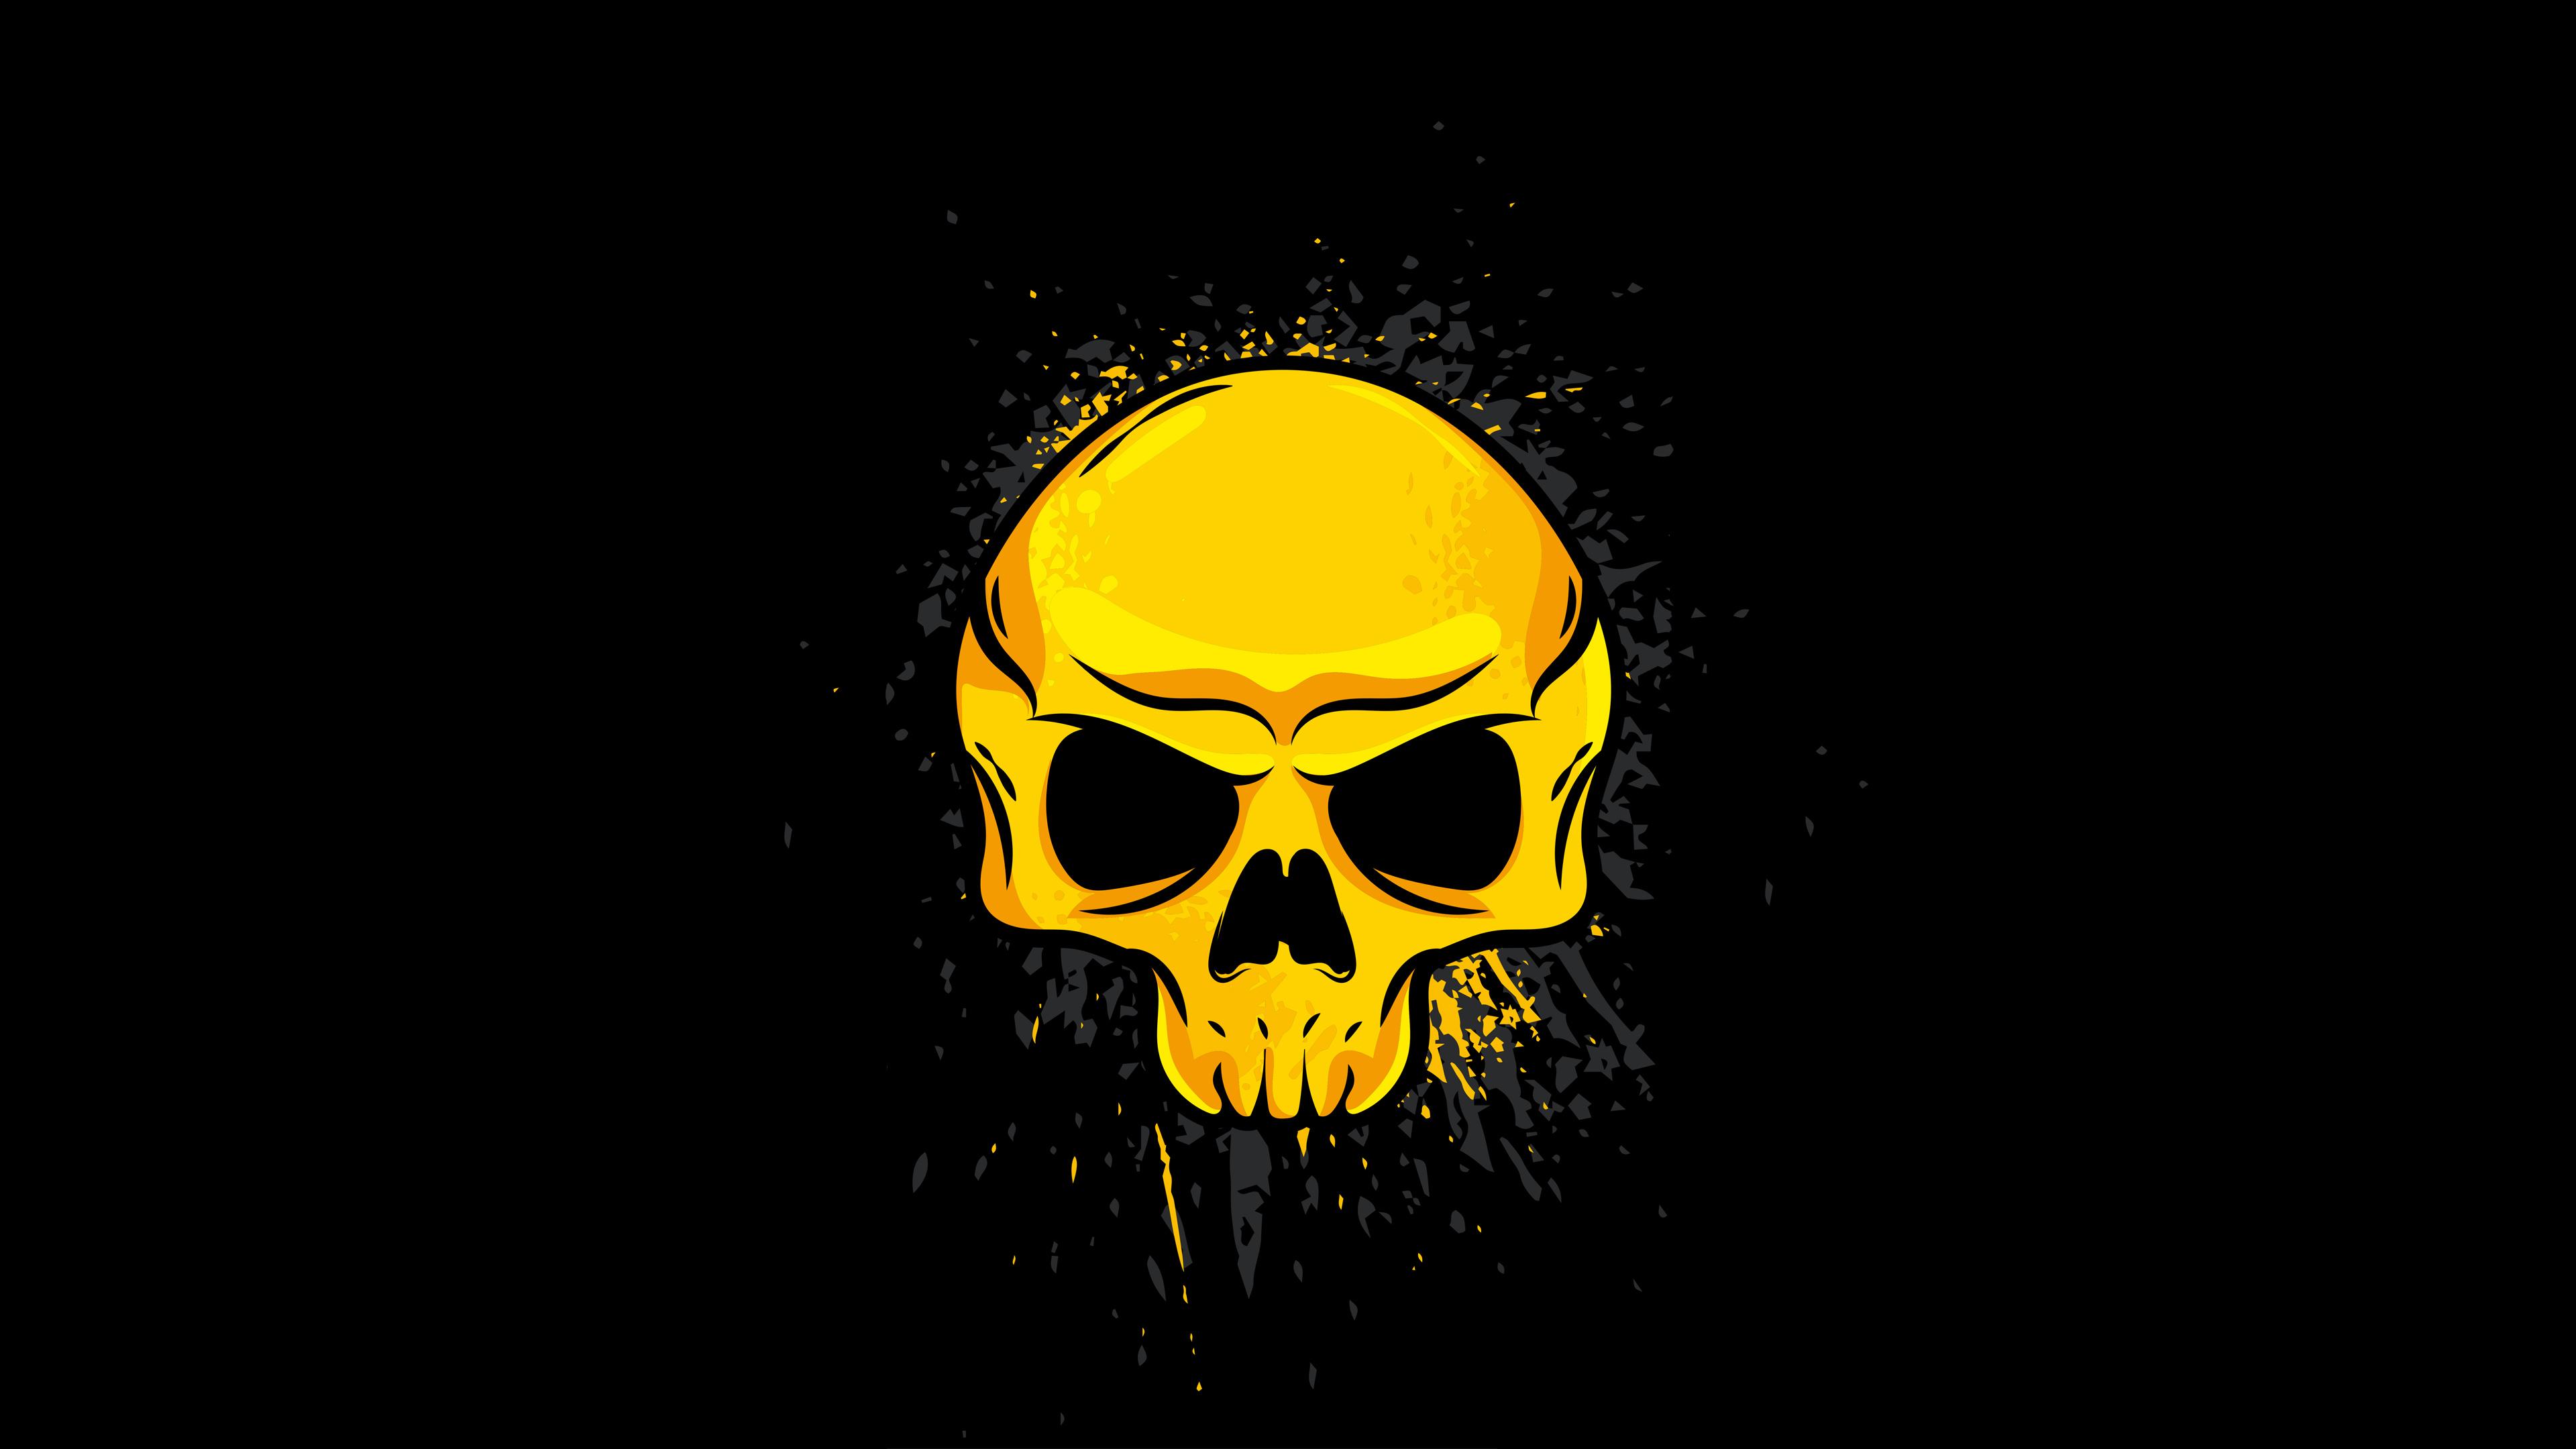 4k Gold Skull Wallpaper Hd Artist 4k Wallpapers Images